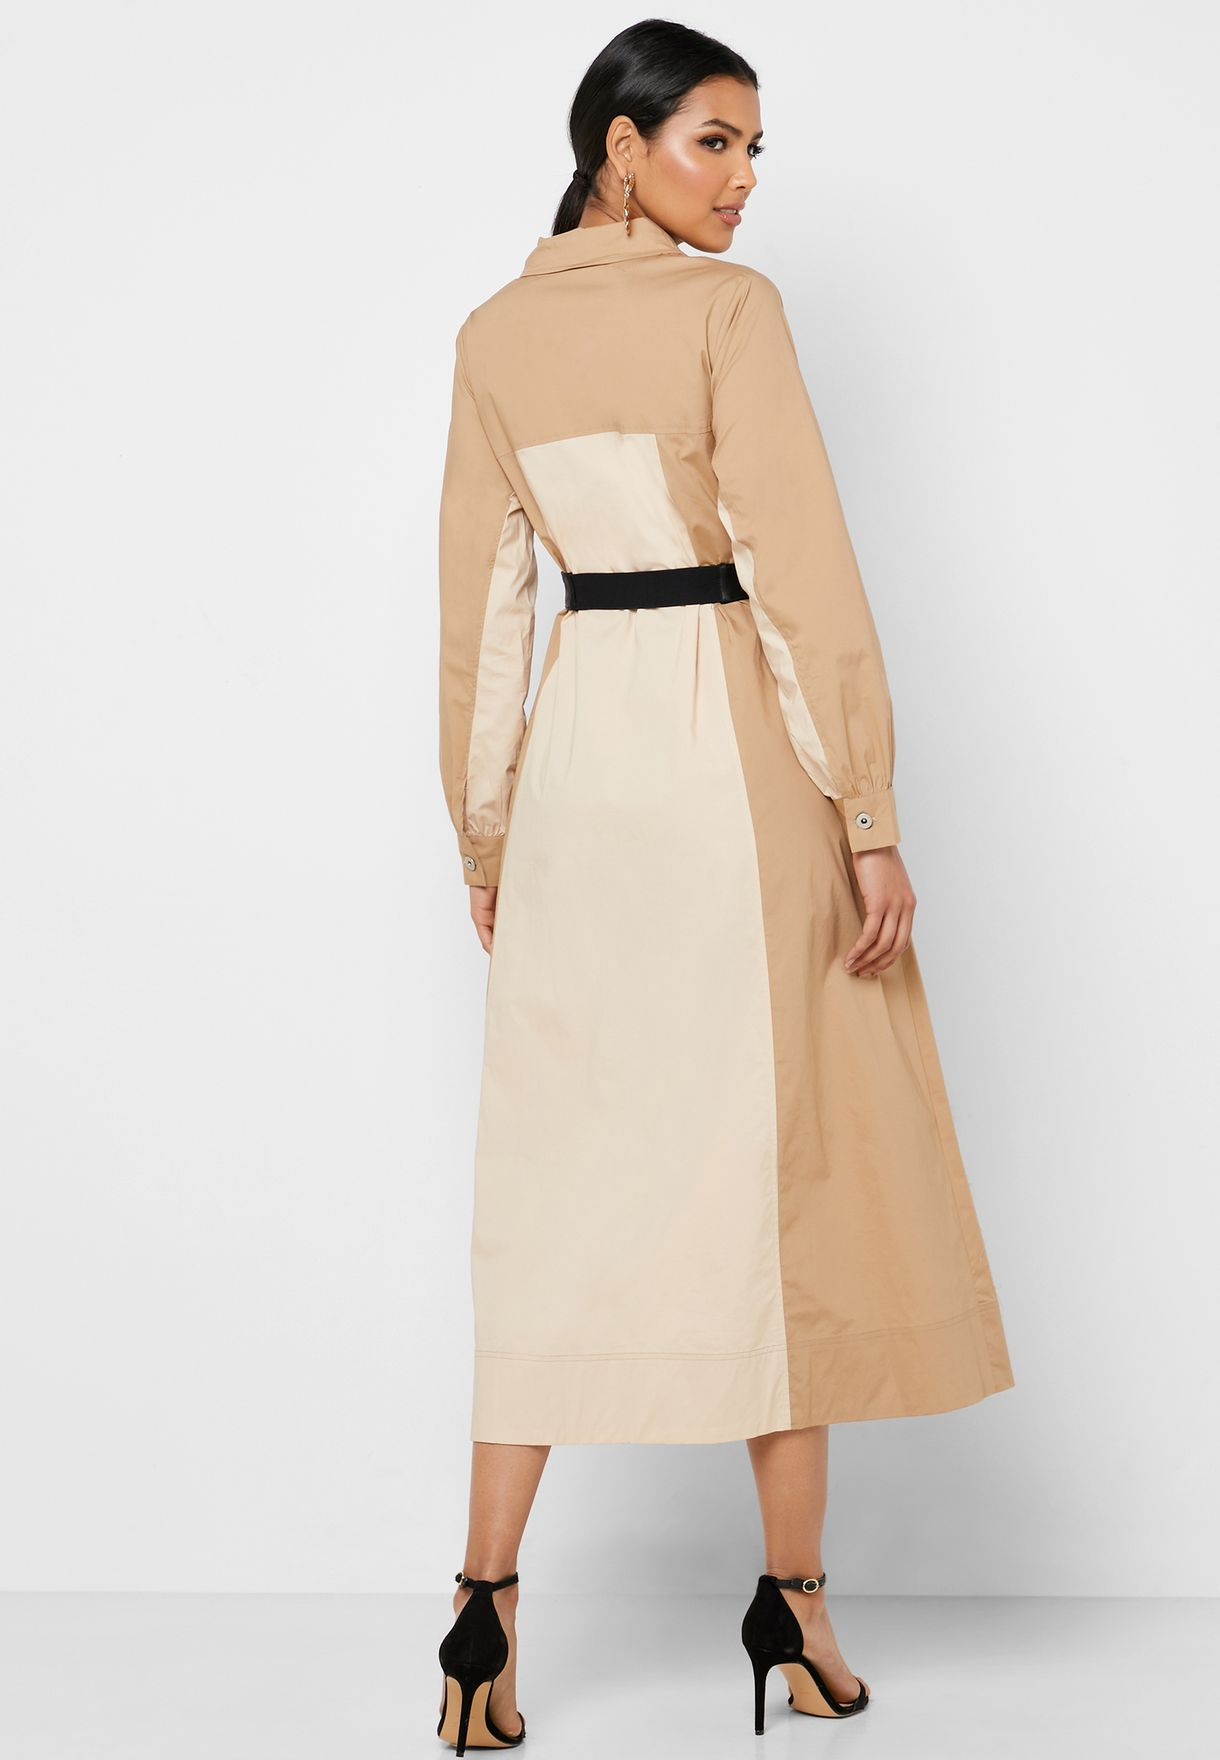 Colorblock Belted Shirt Dress